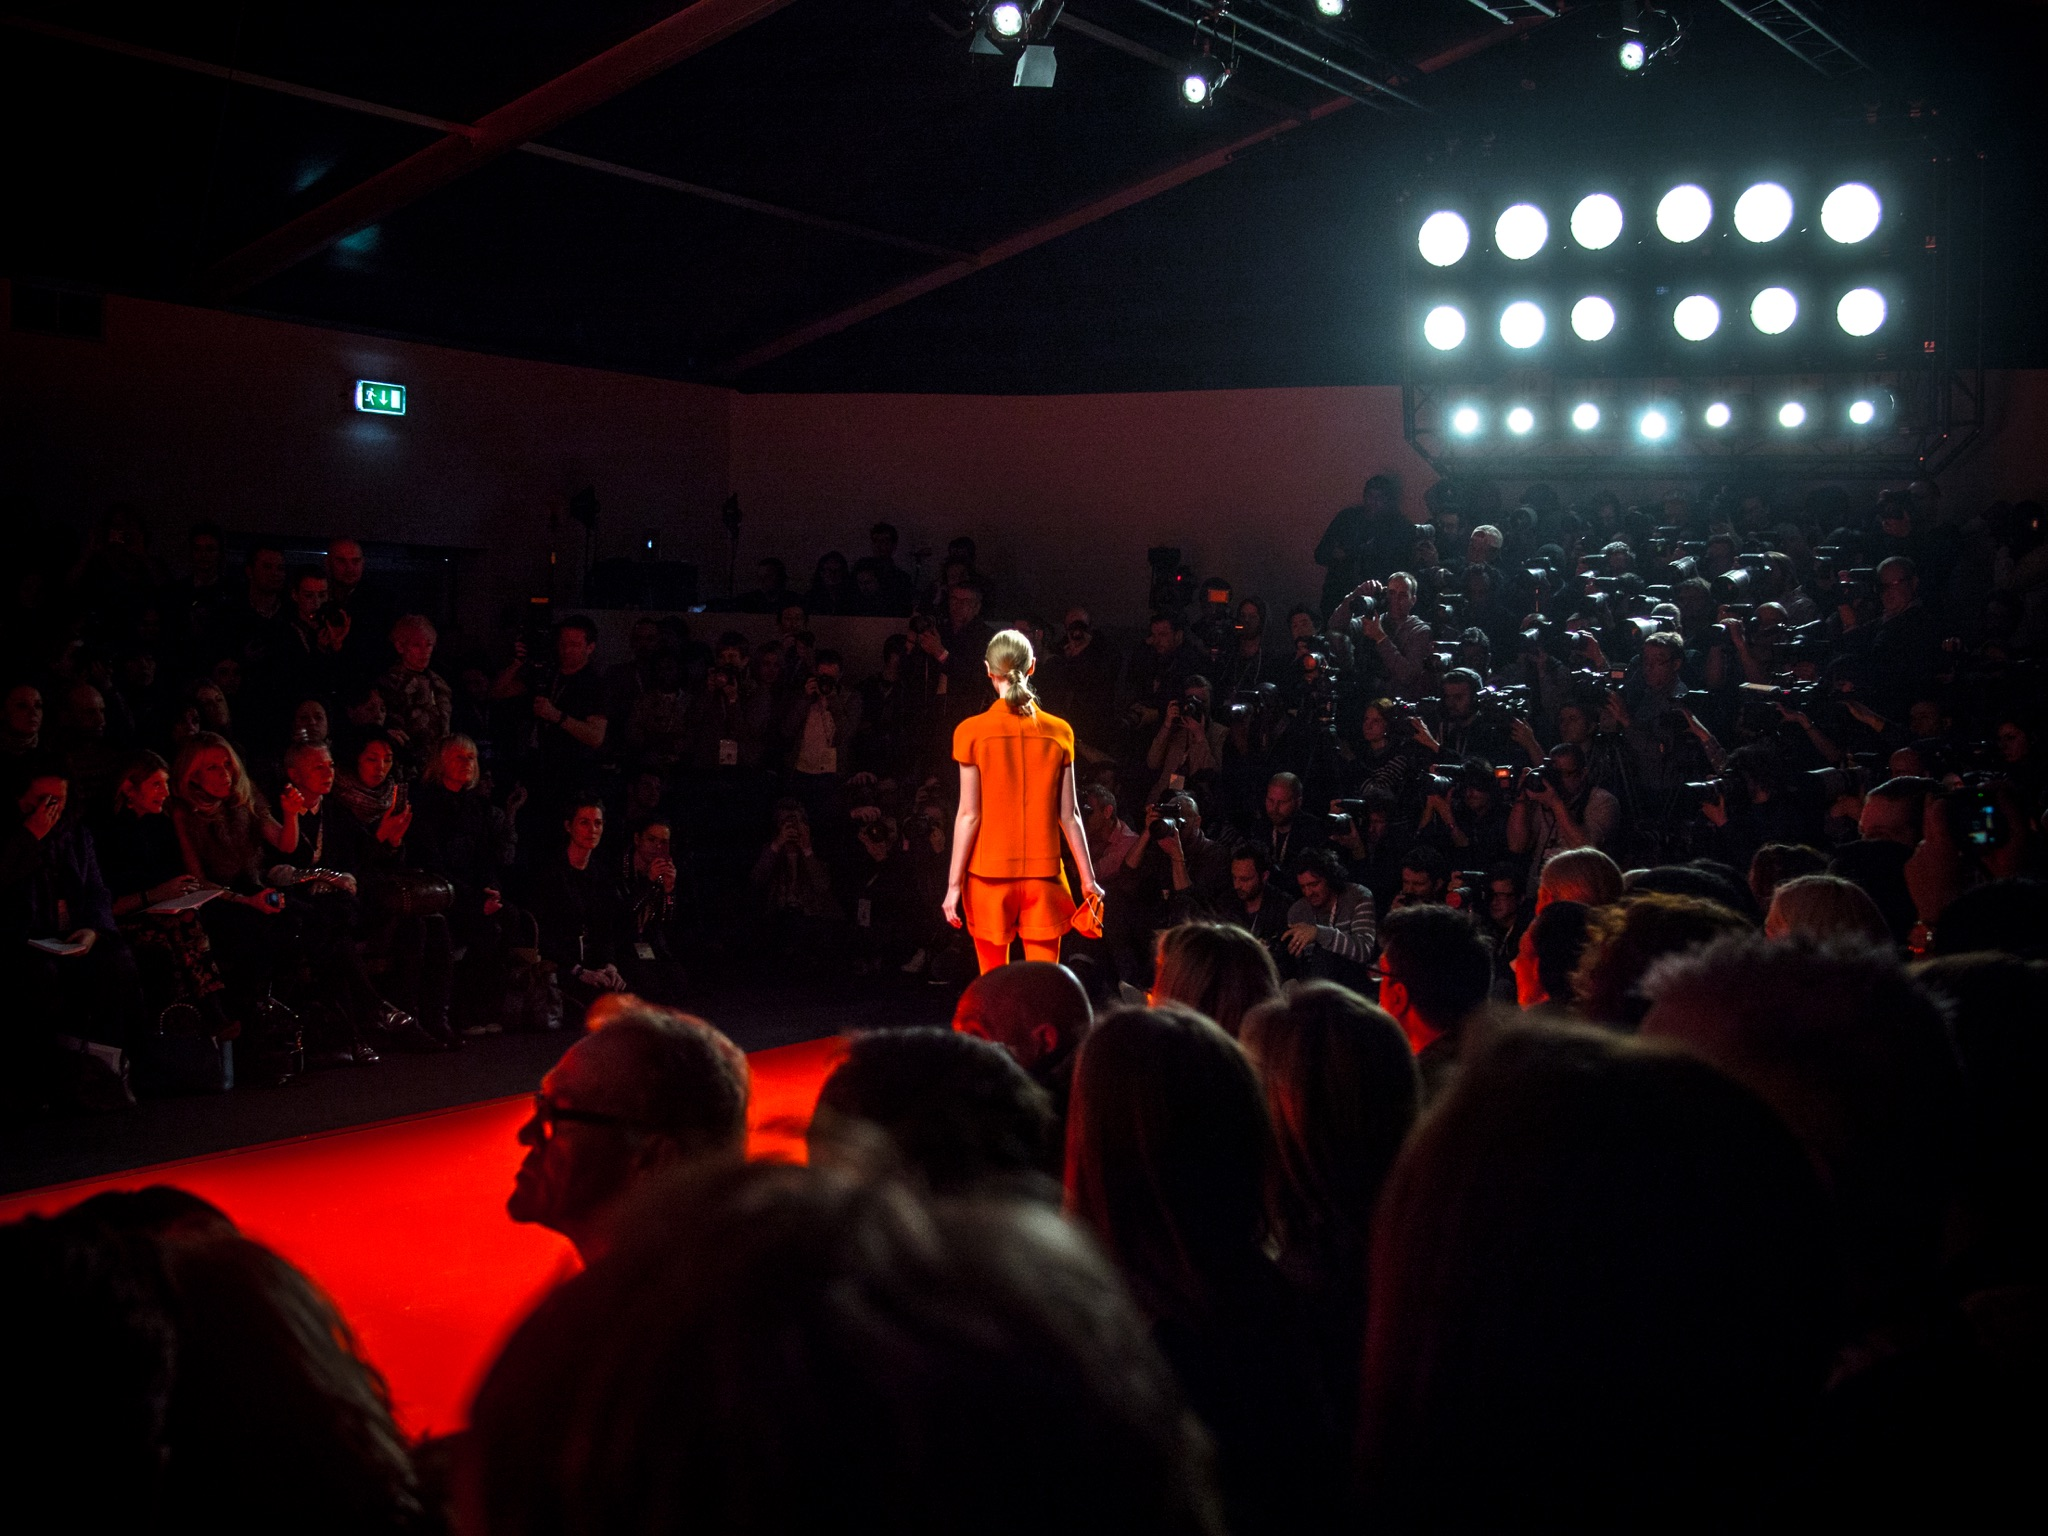 London Fashion Week LFW Runway Show Photography Photograph How to Model Walking Catwalk Youtube Video Guide Tutorial Jasper Conran Red